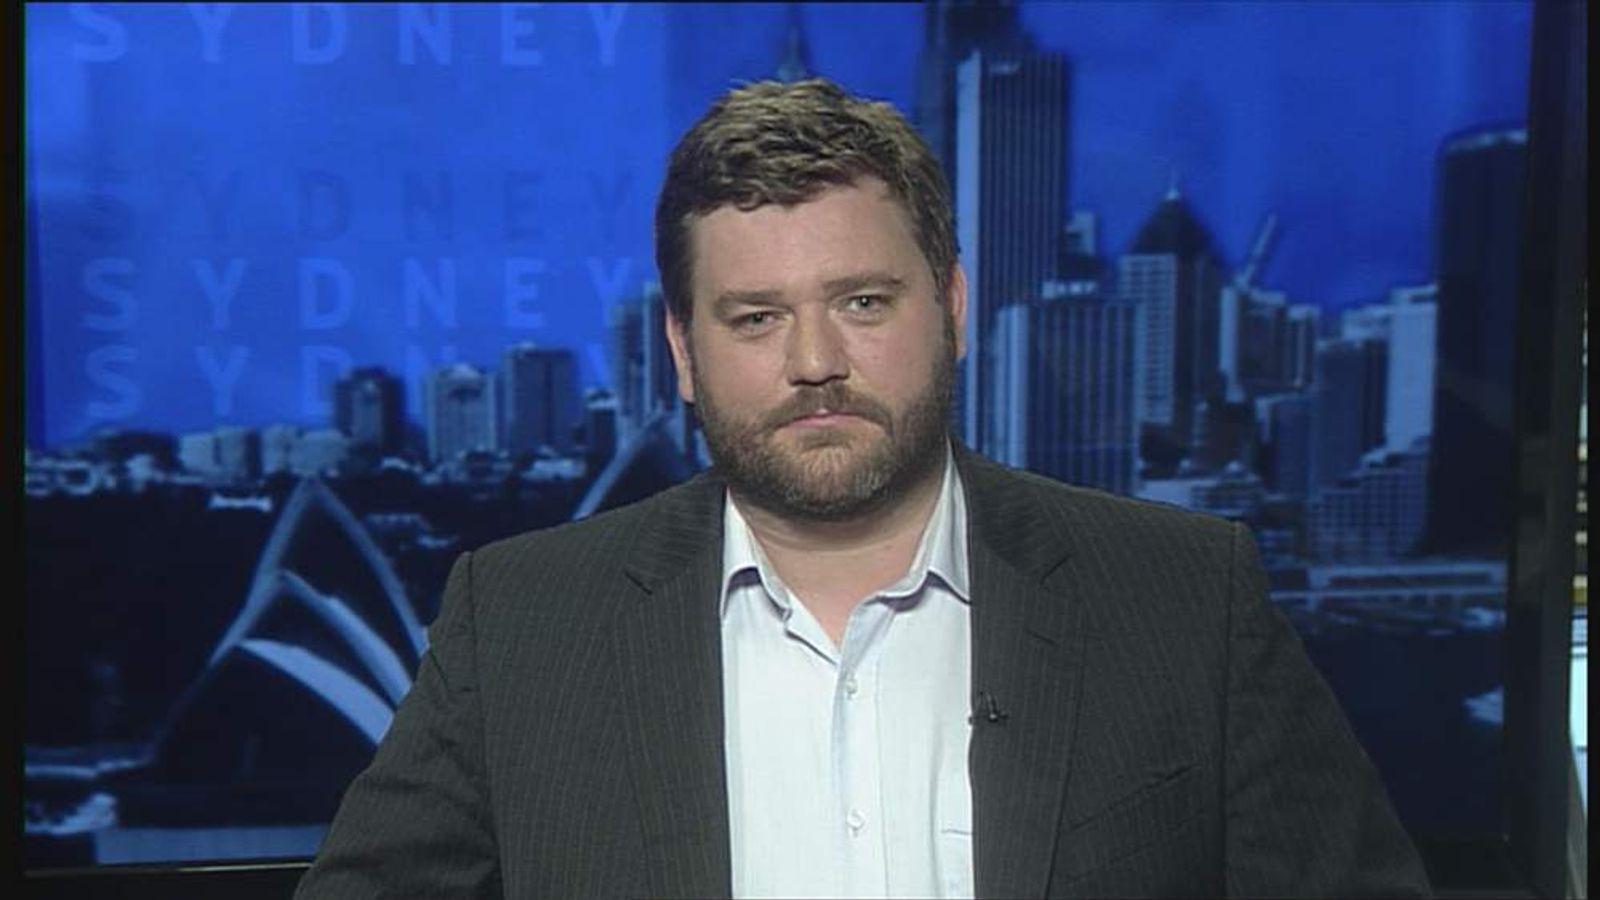 Australian radio host Paul Murray